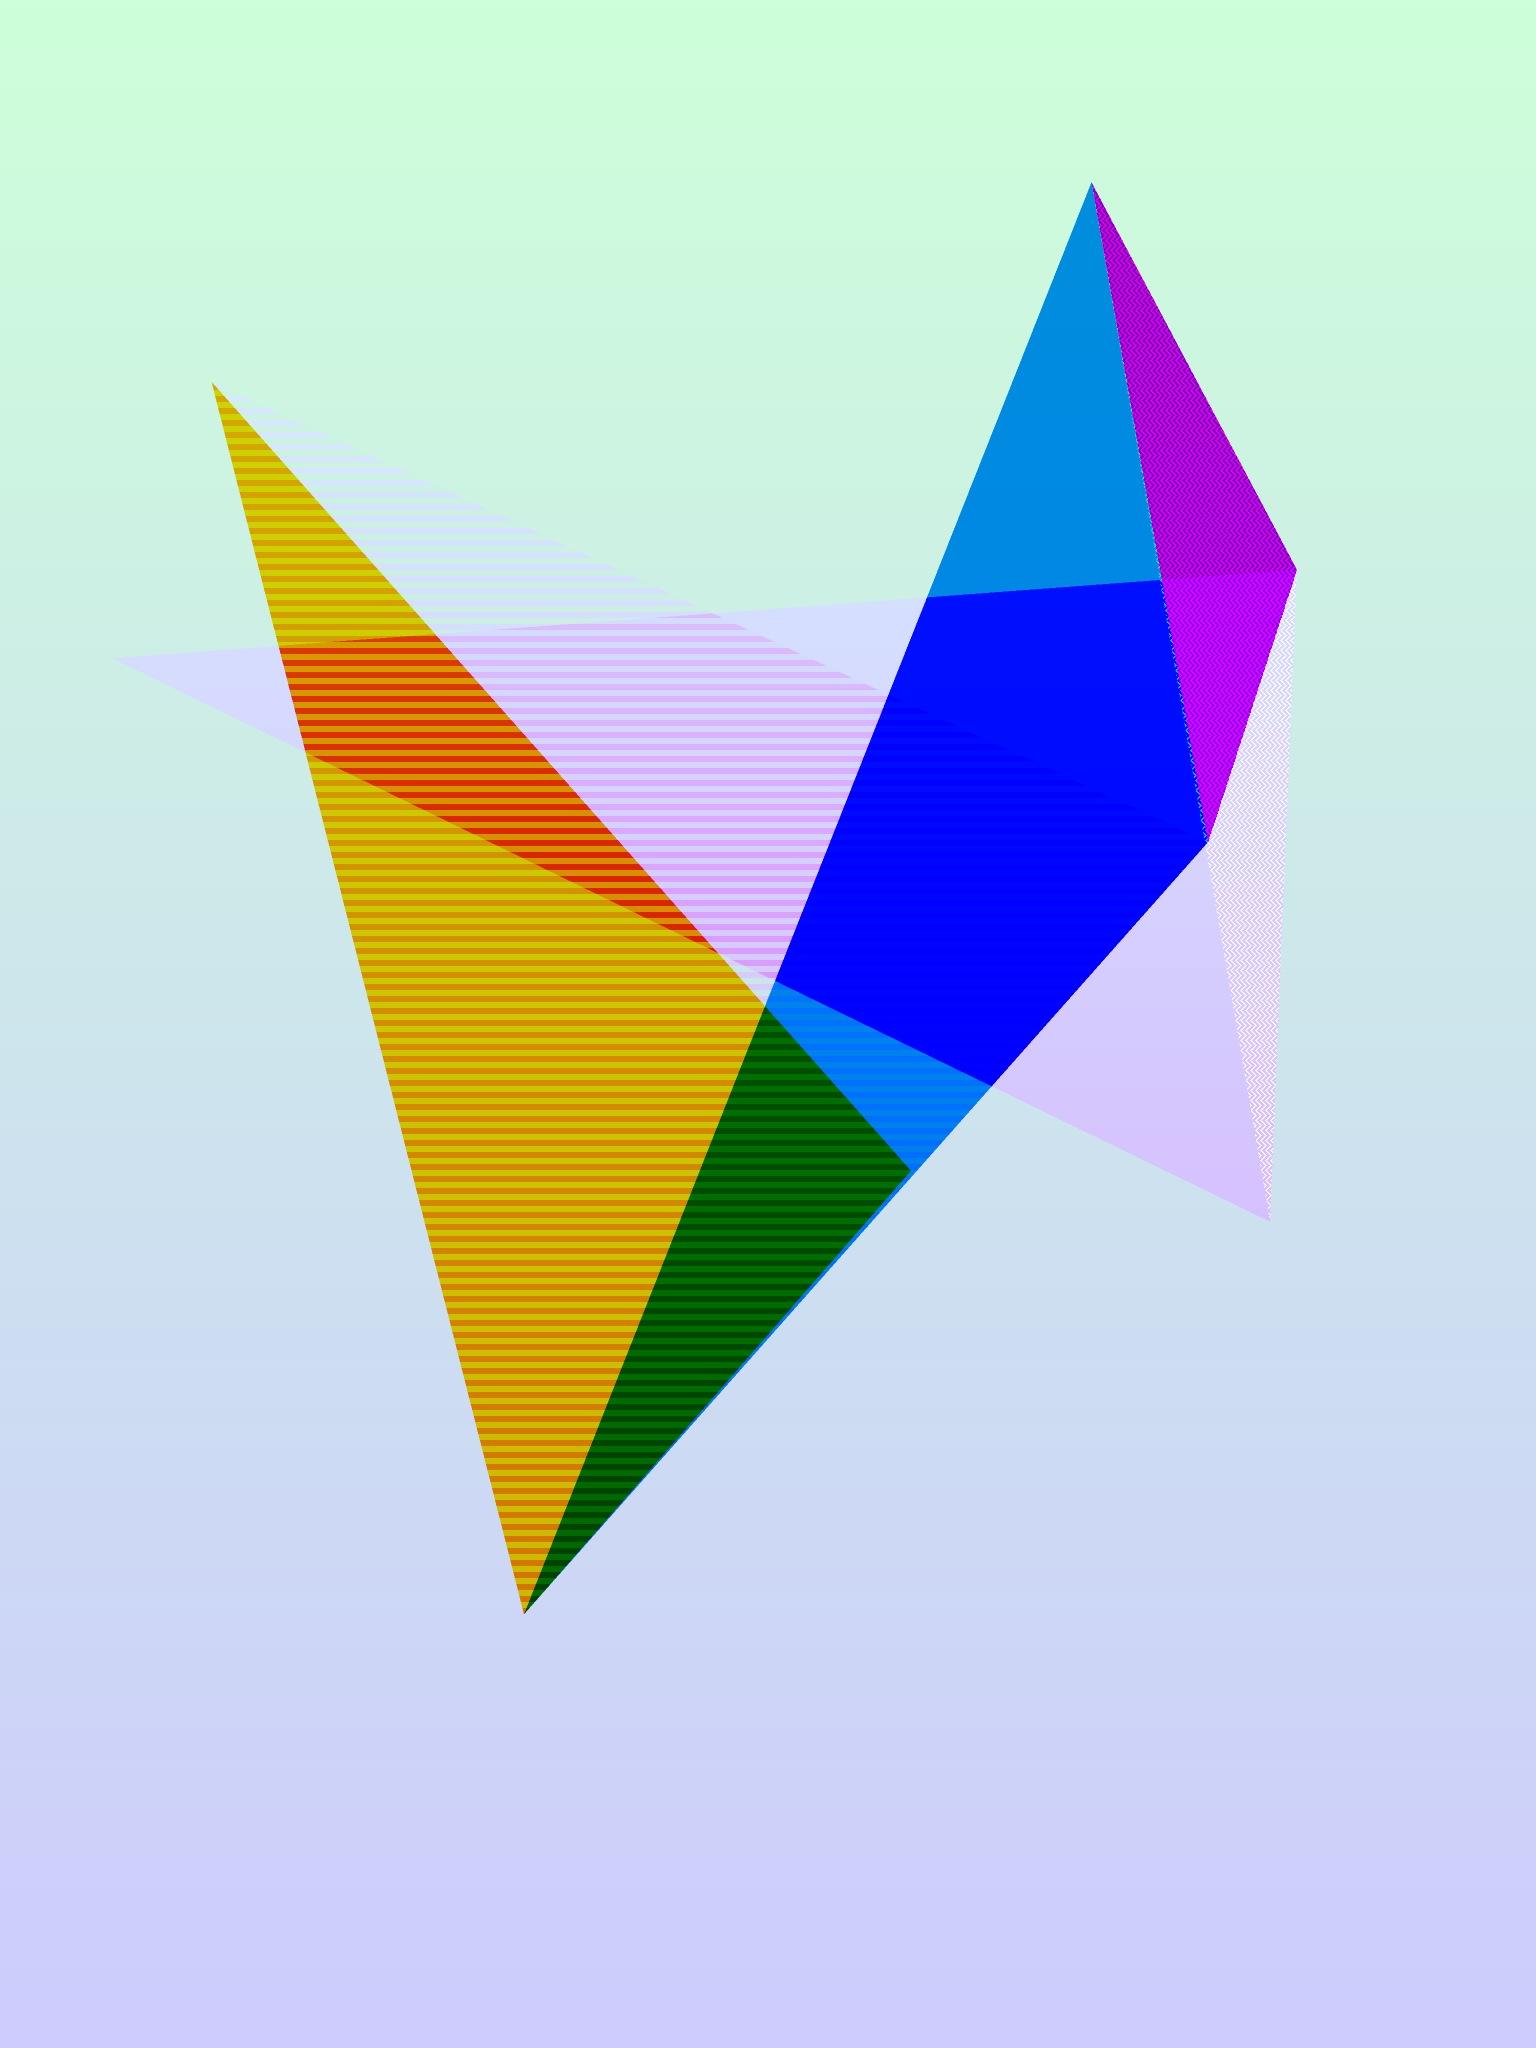 Triangulate_03